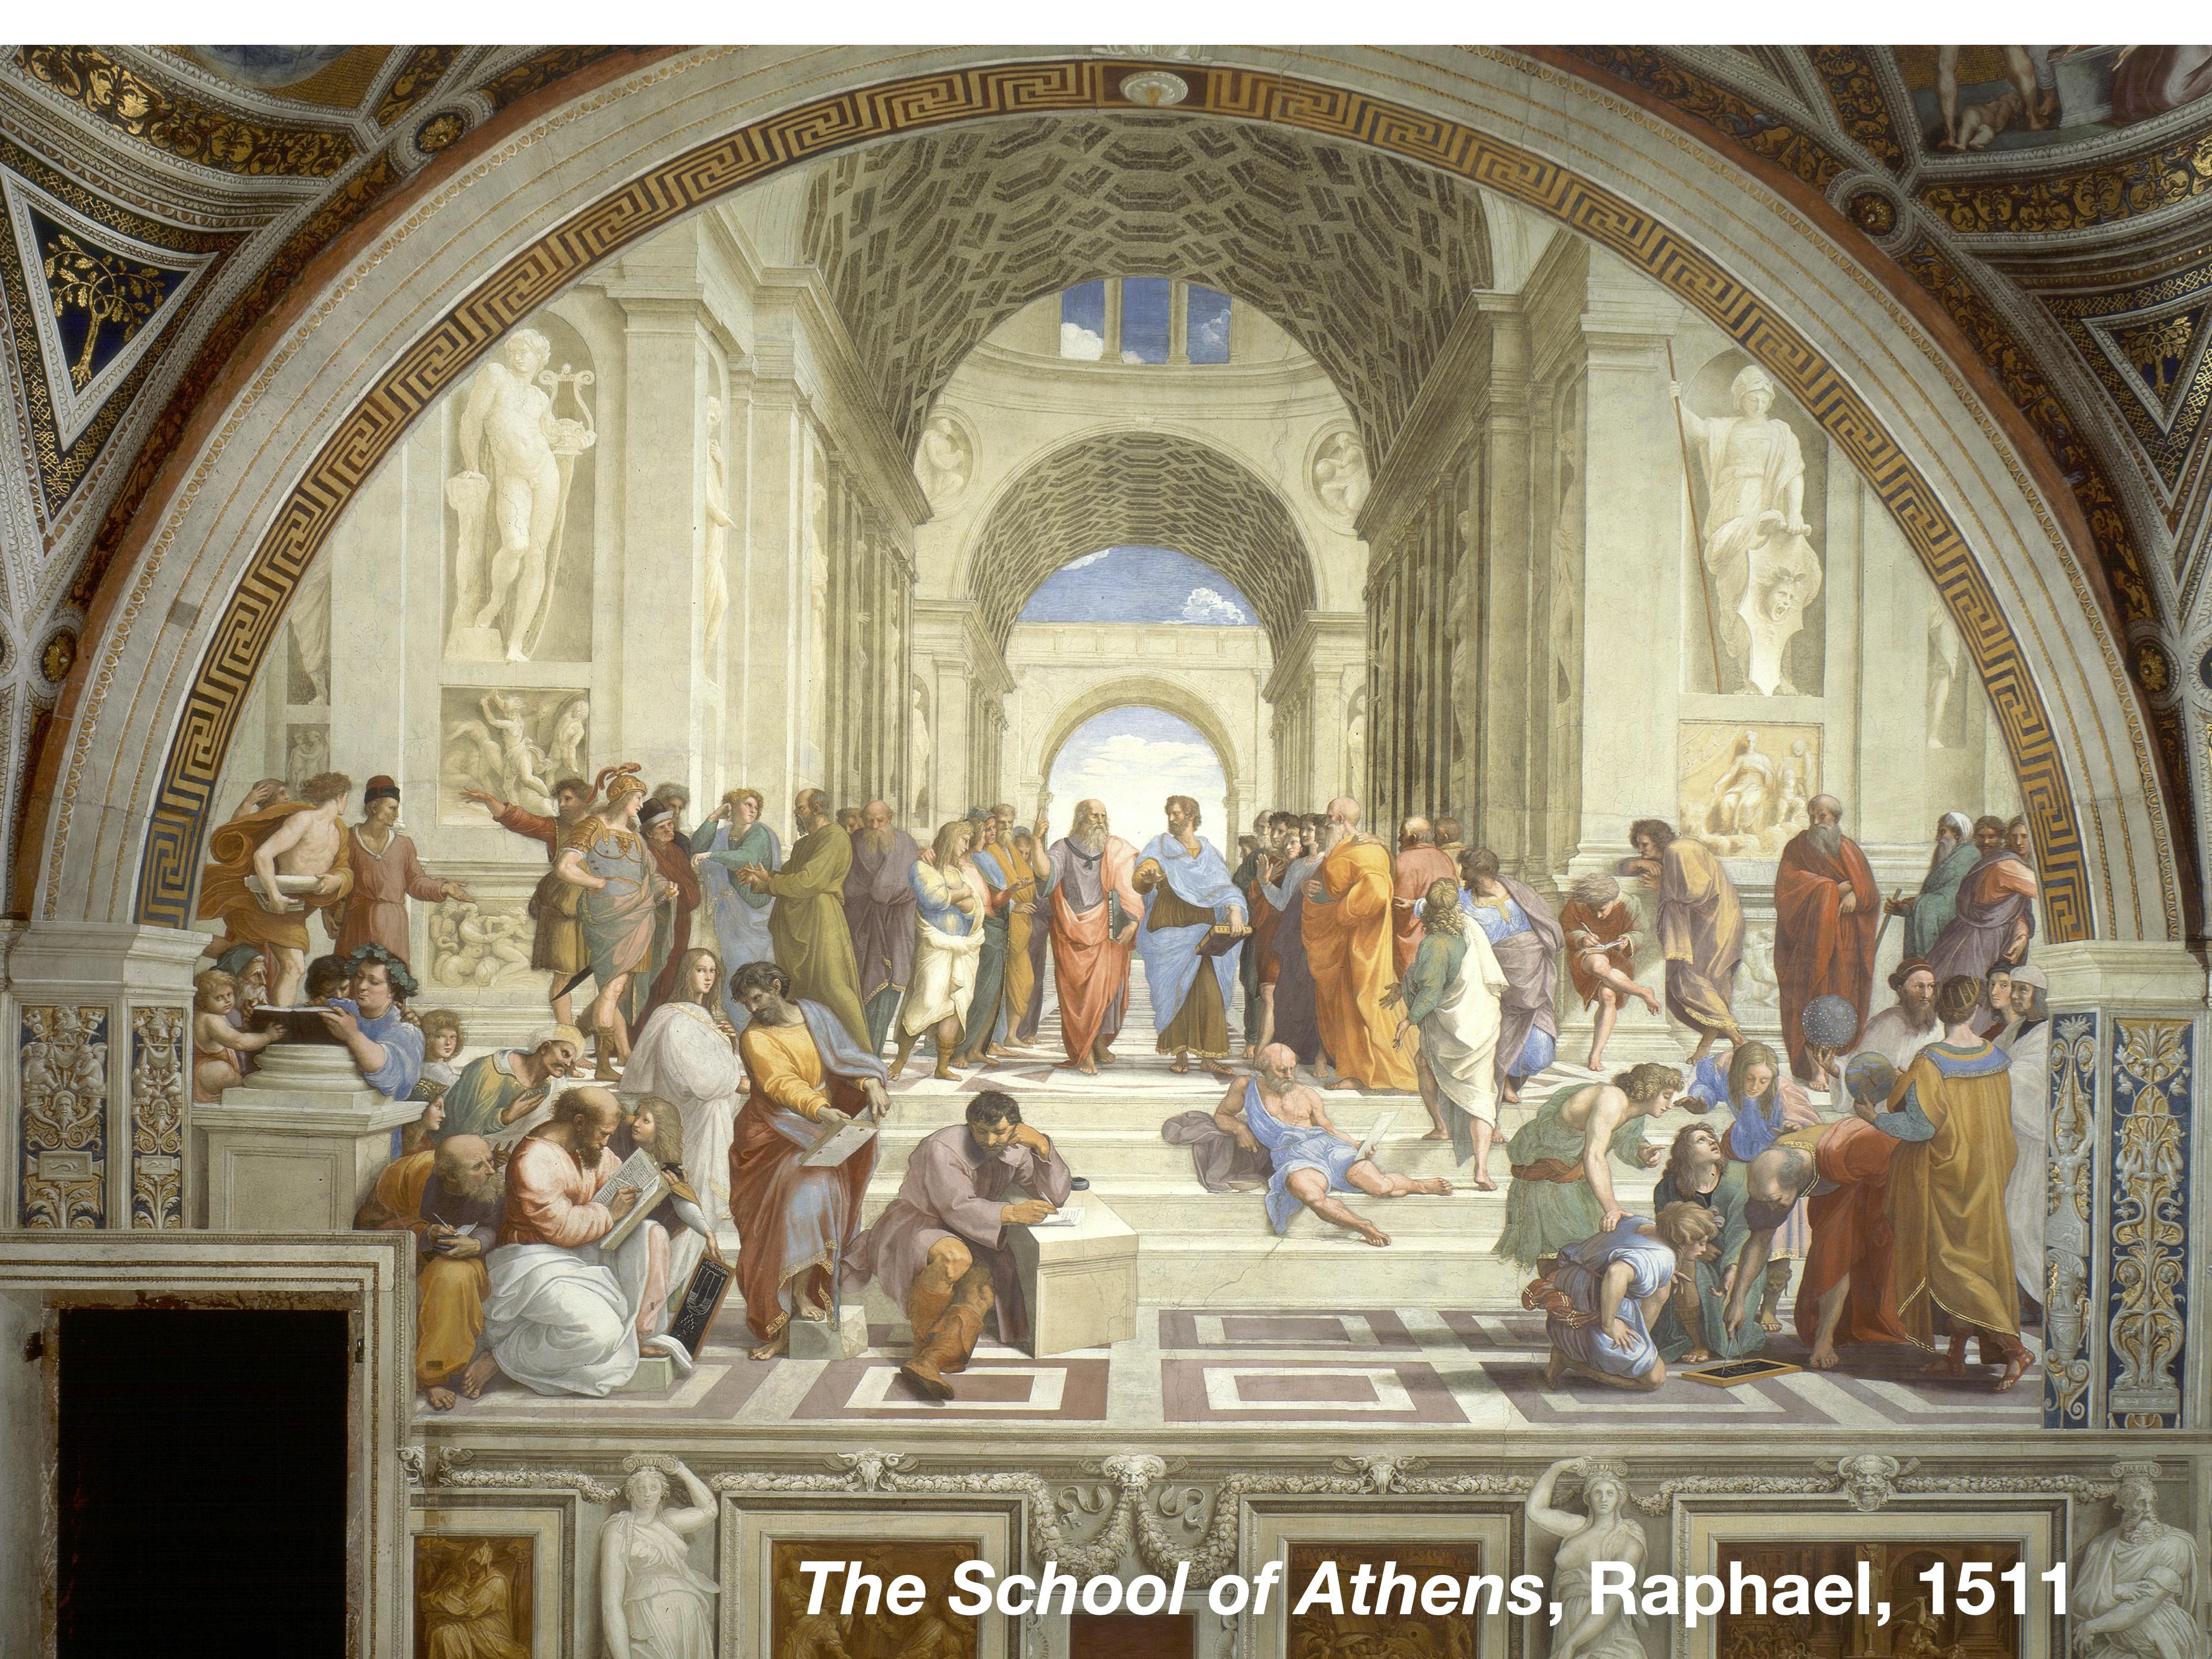 Raphael linear perspective